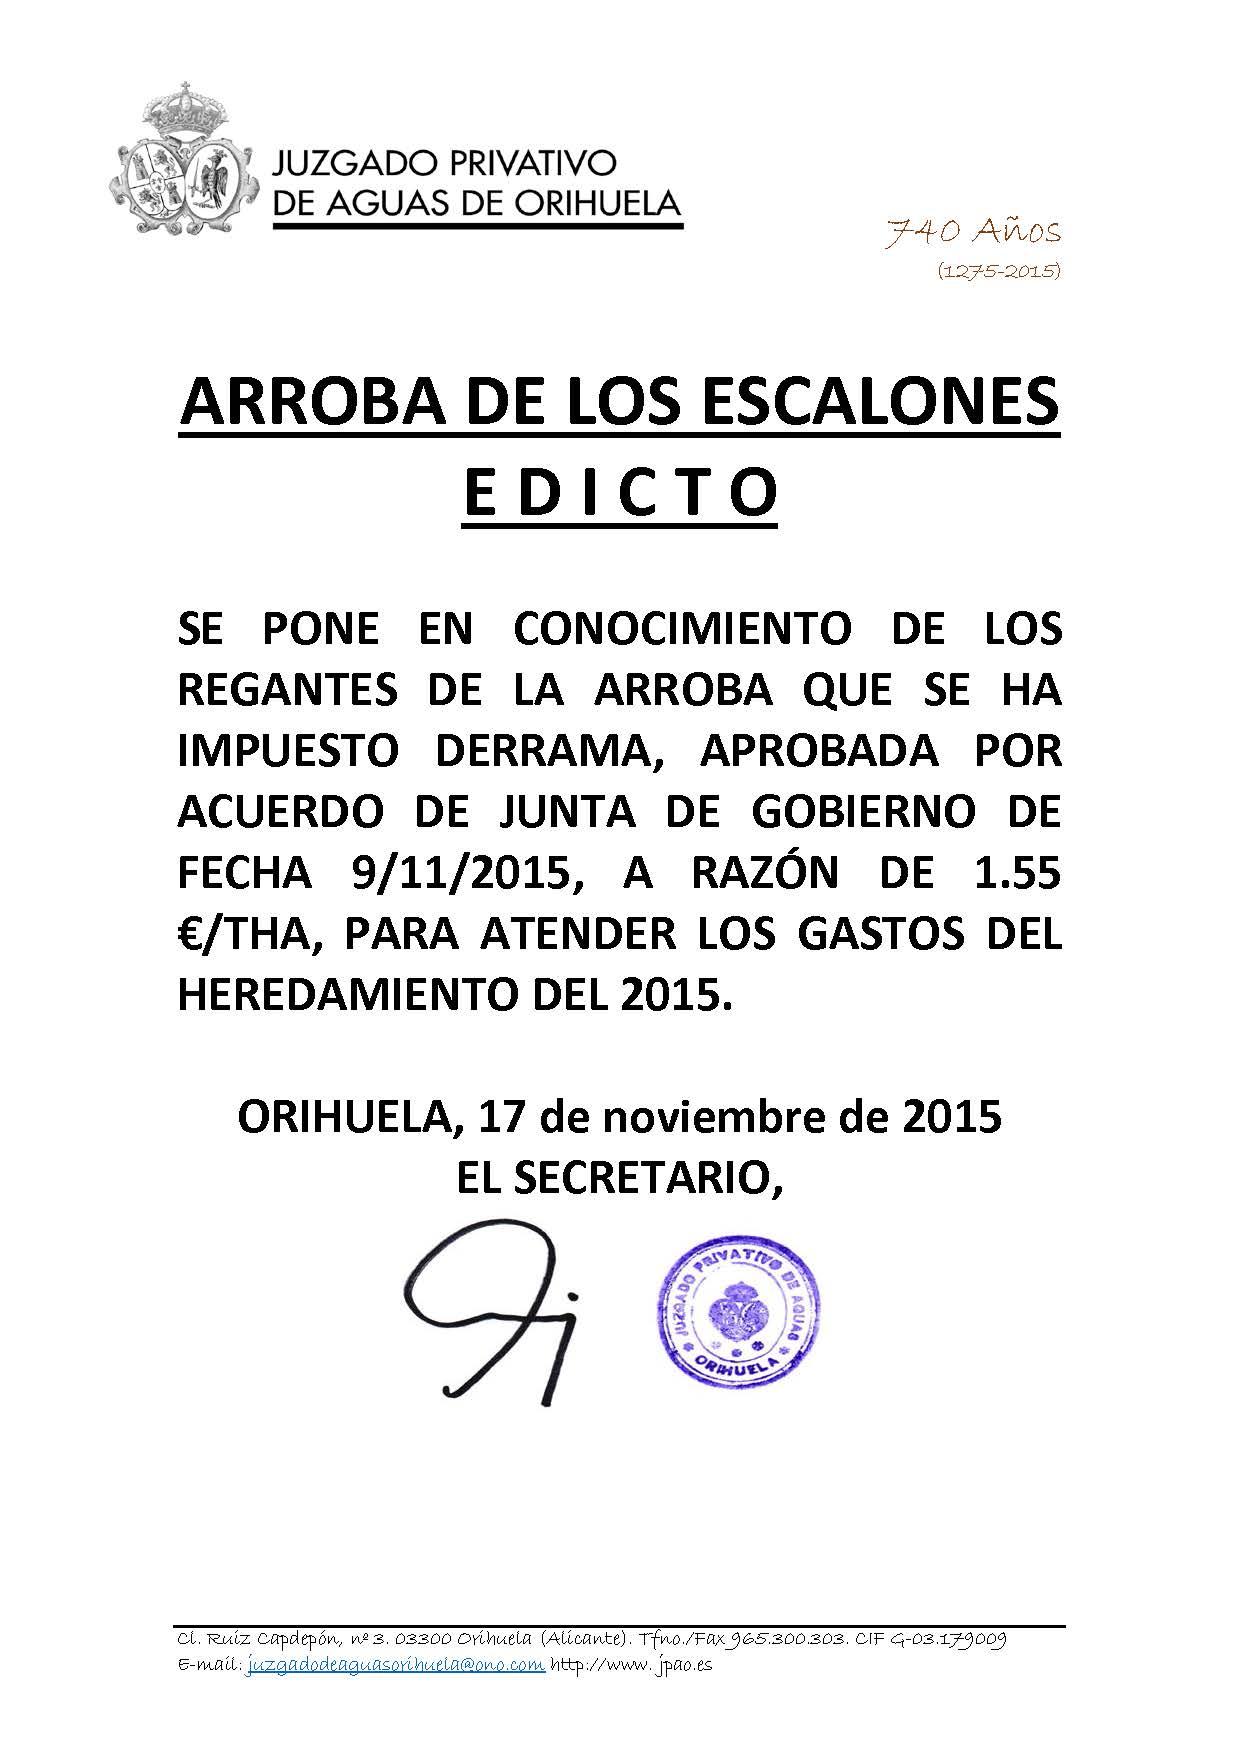 196 2015 ARROBA ESCALONES. edicto imposicion derrama